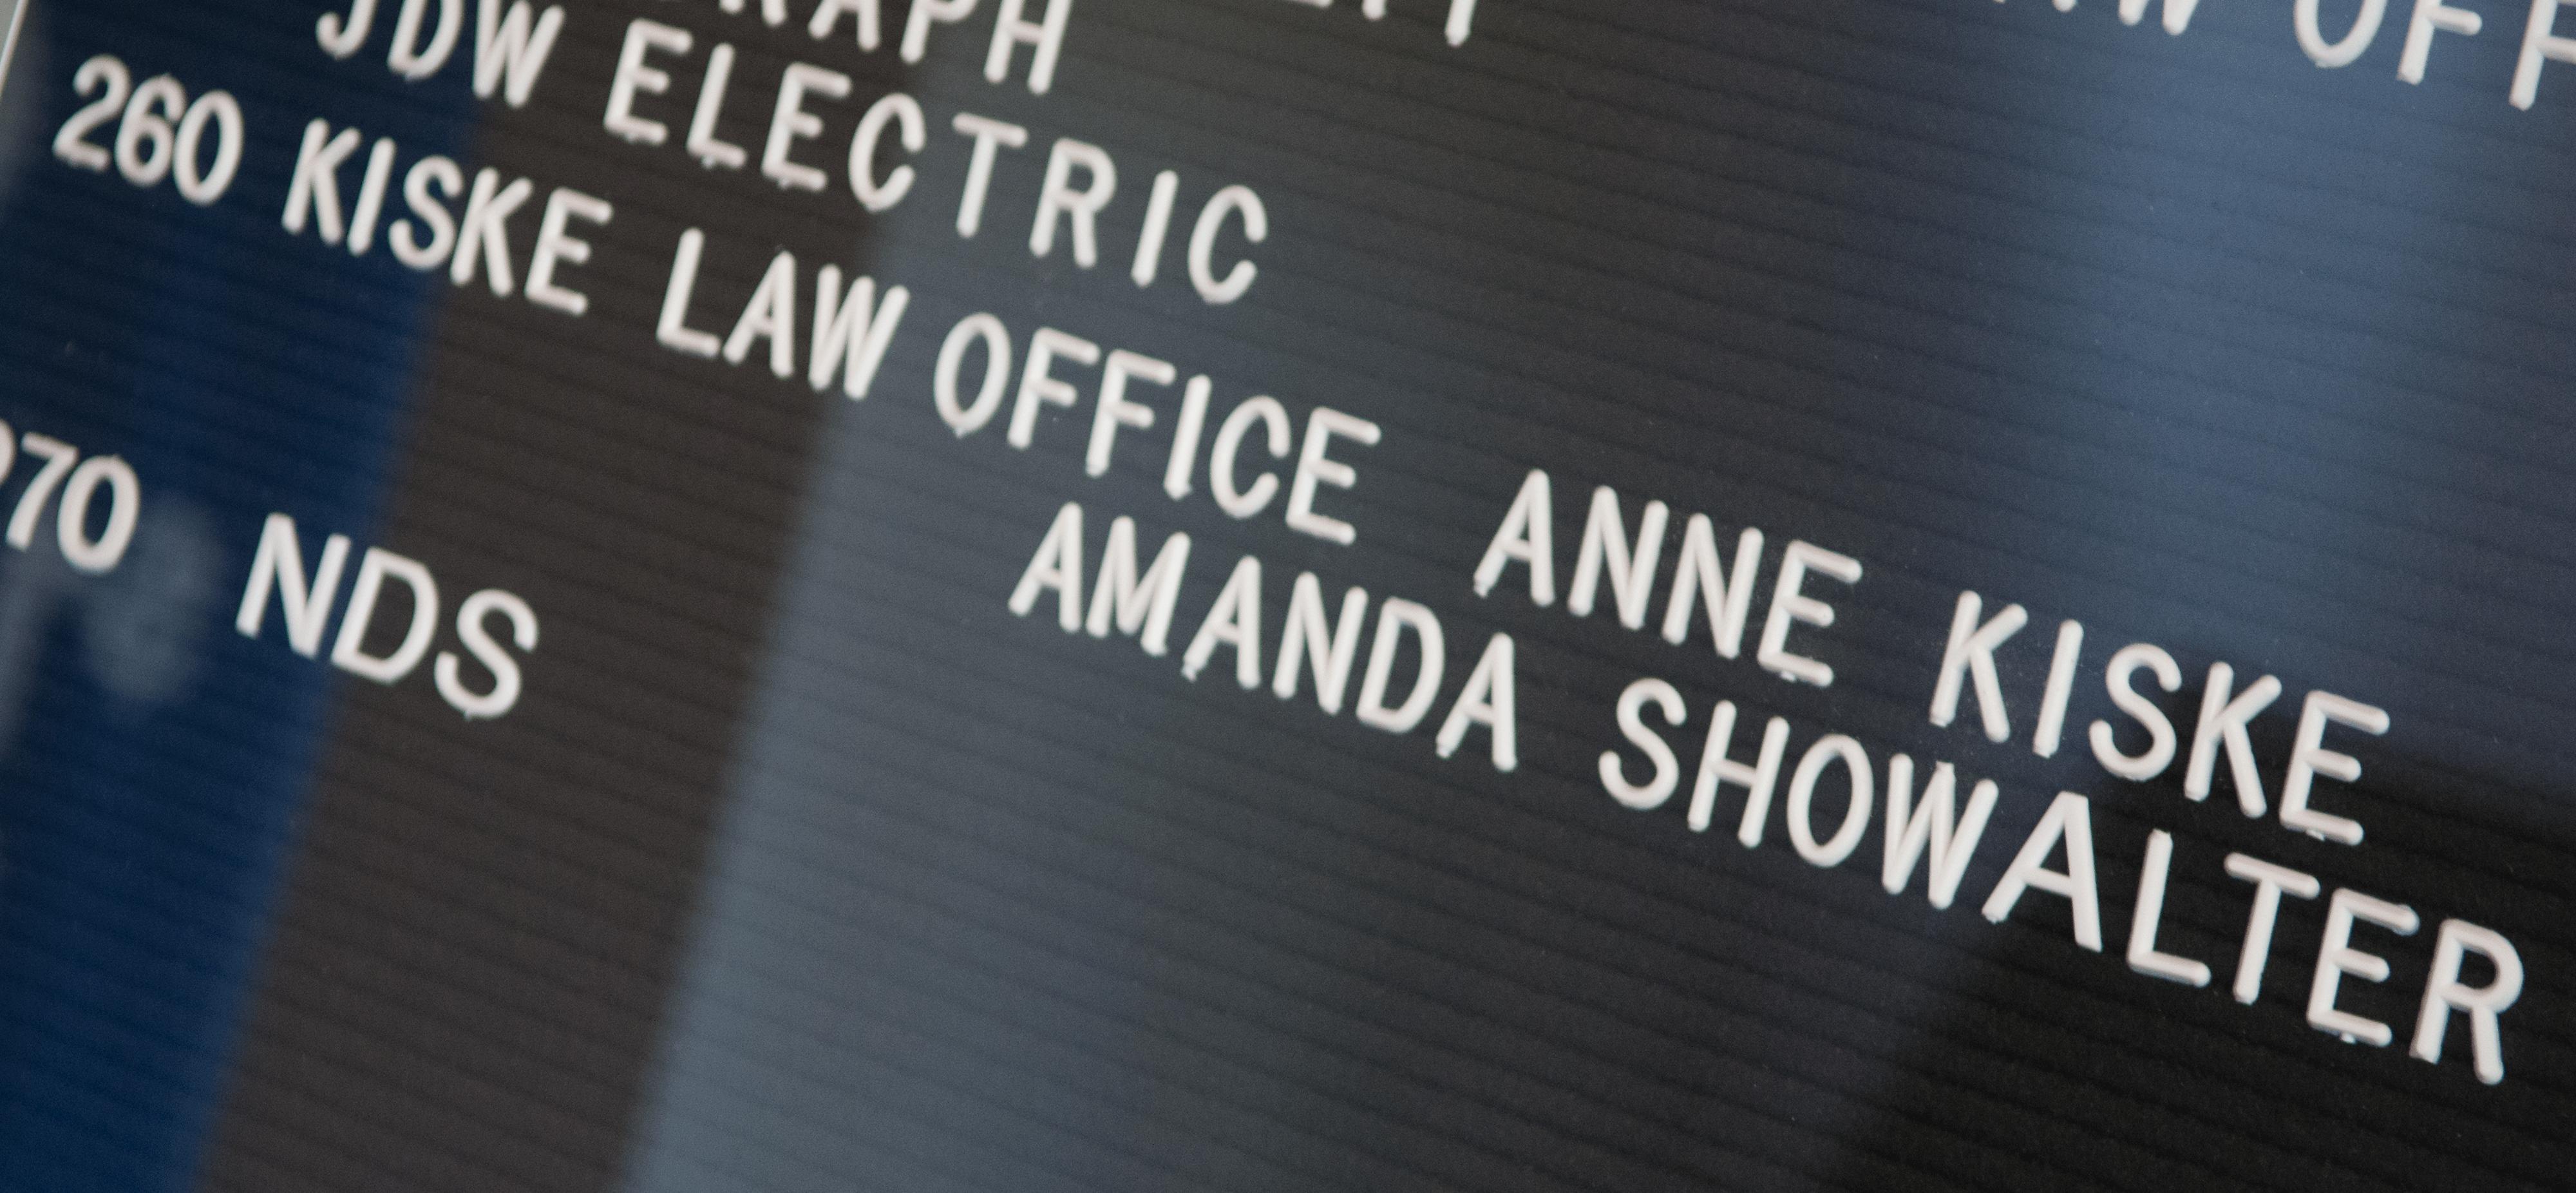 Kiske Law Office, LLC image 9